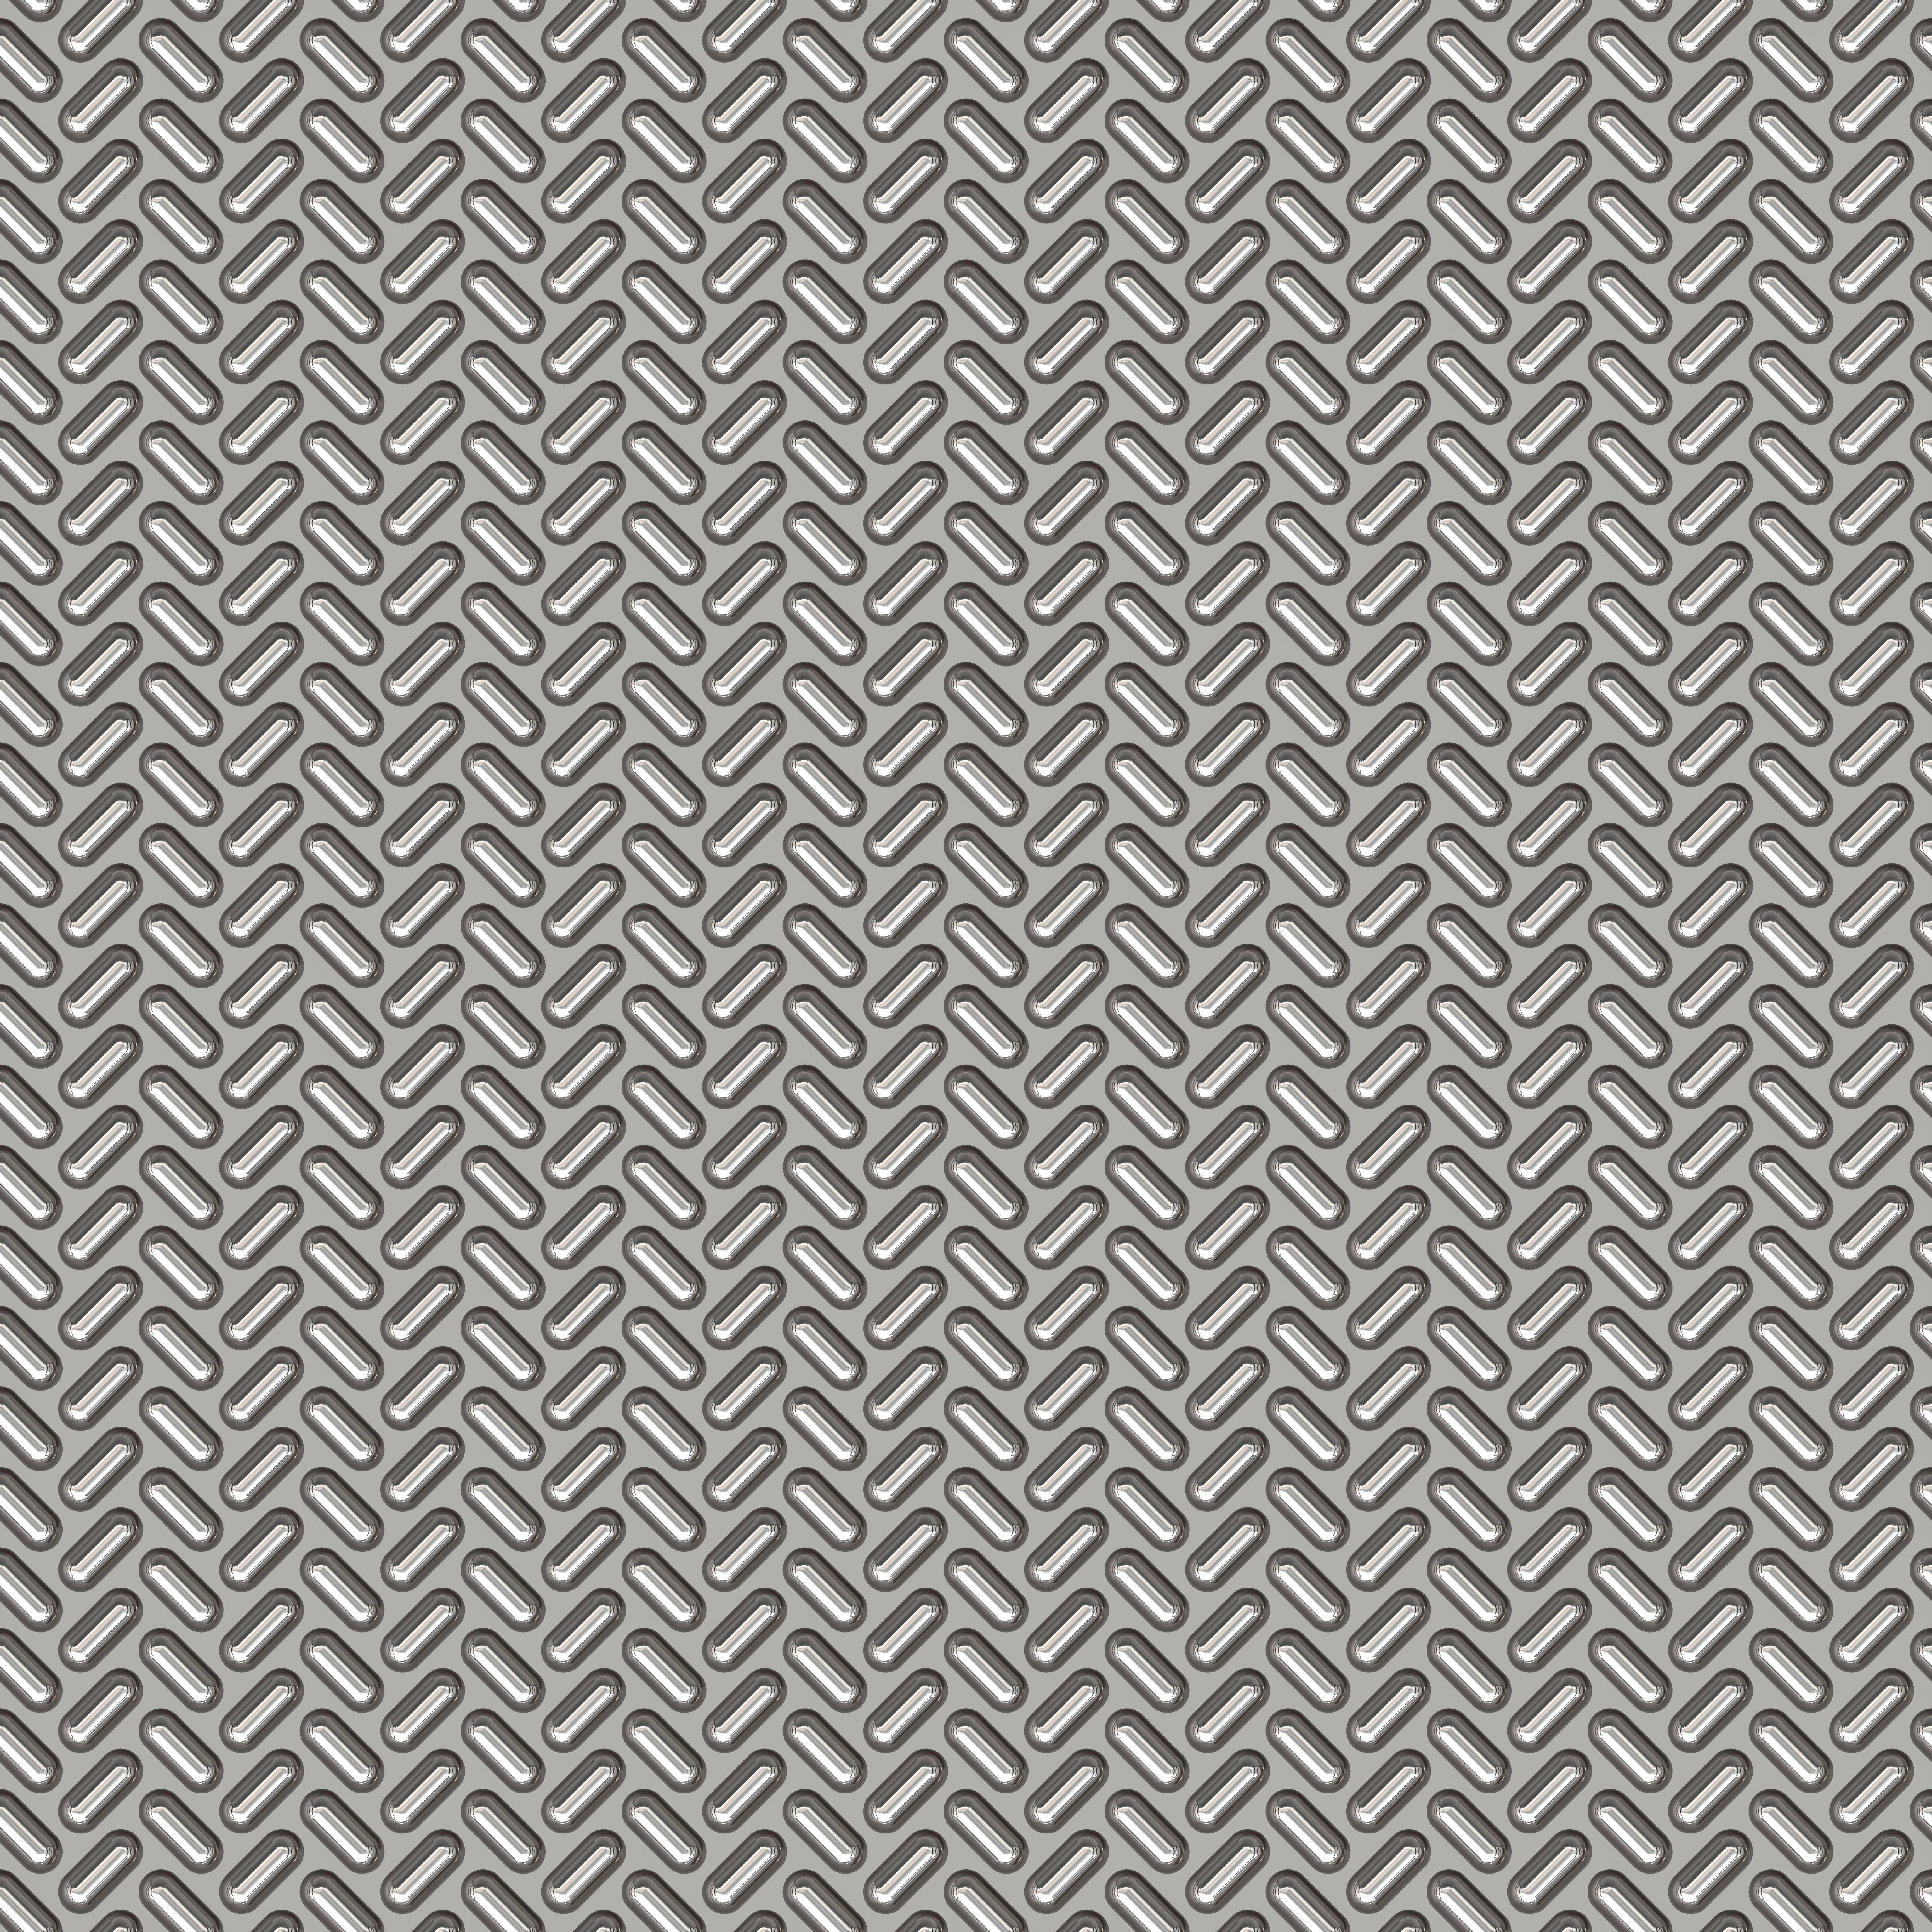 diamond or tread plate metal background texture wwwmyfreetextures 5000x5000